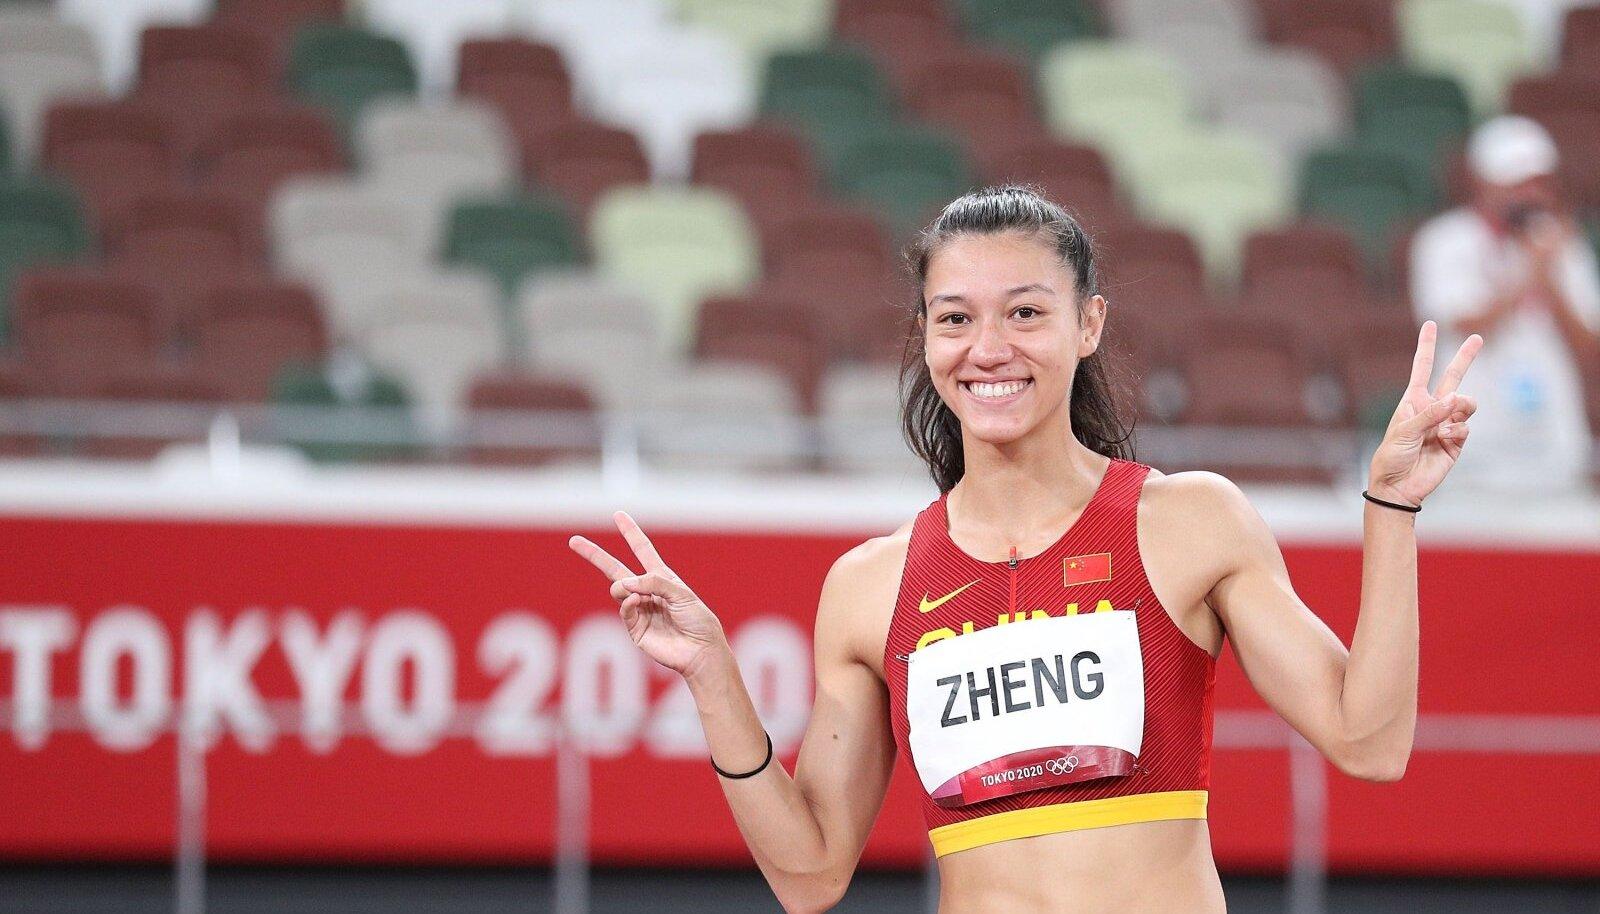 Ninali Zheng